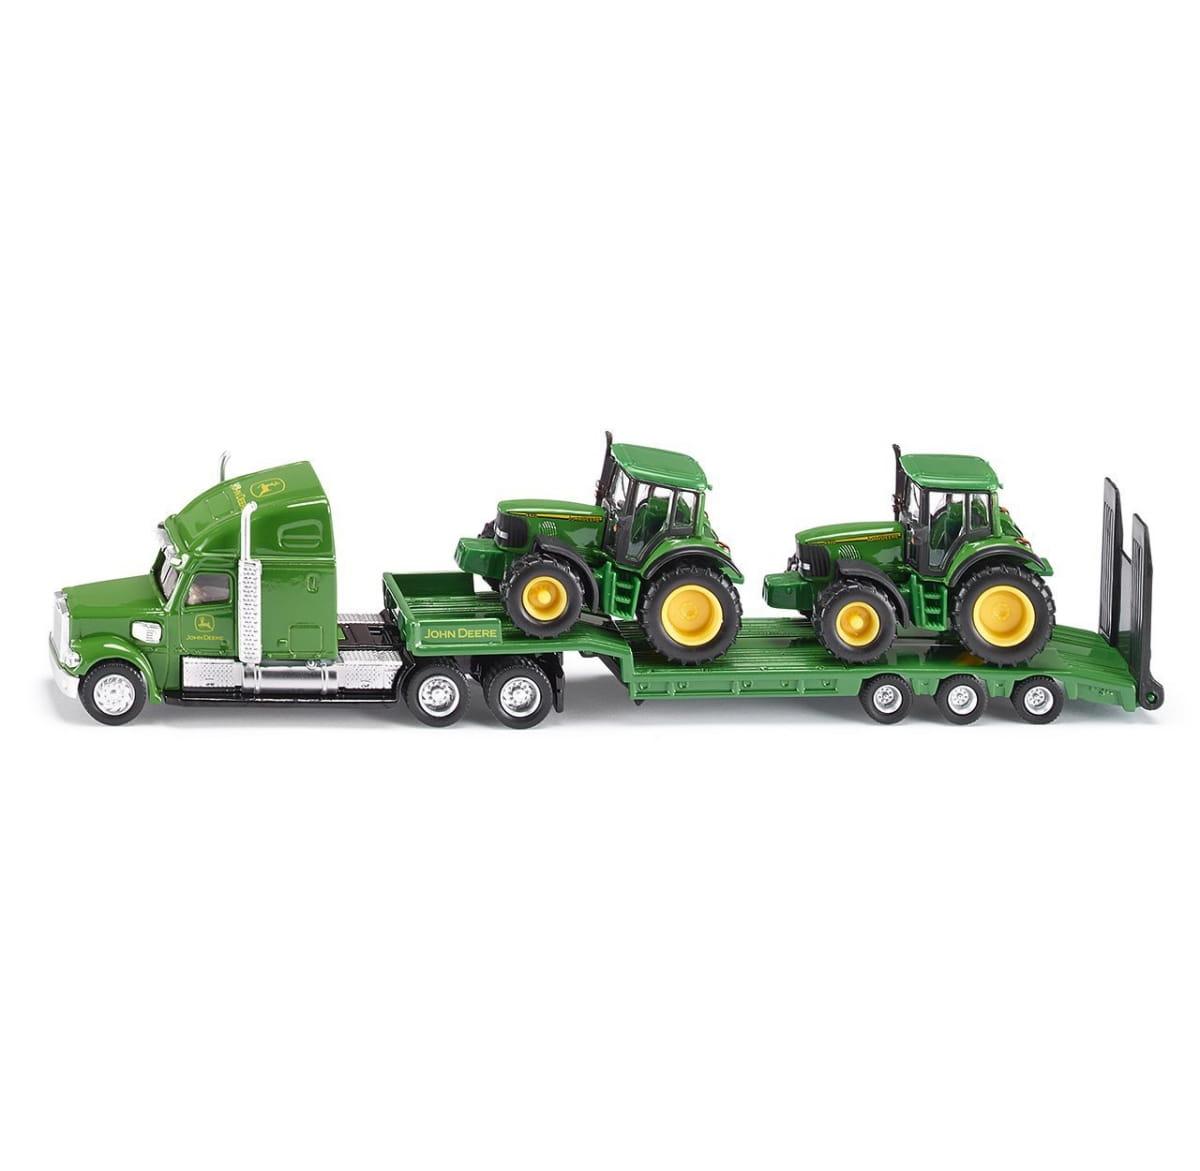 Тягач SIKU с 2 тракторами Джон Дир 1:87 - зеленый